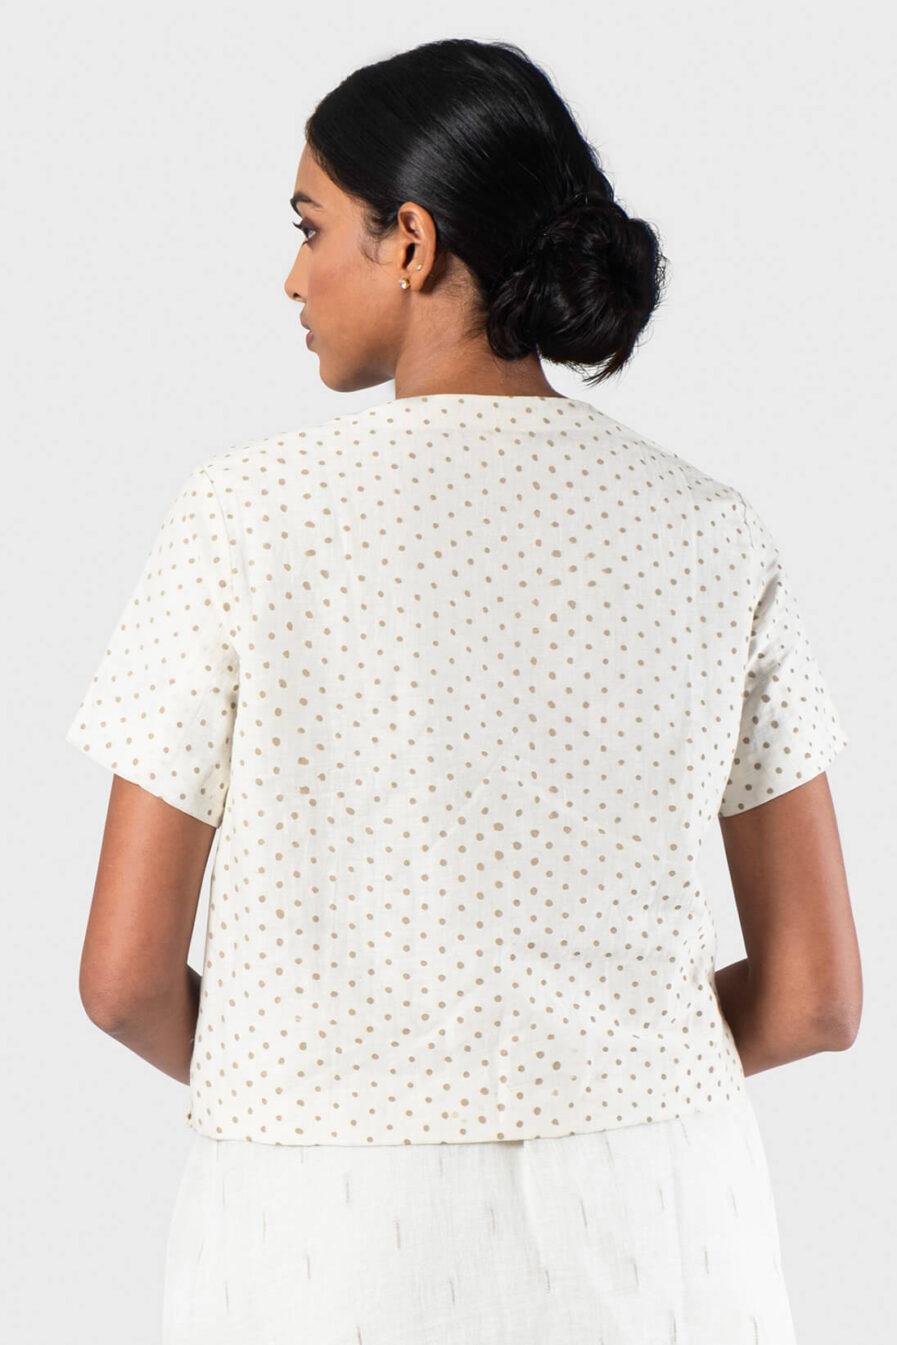 Anavila White V-neck polka blouse